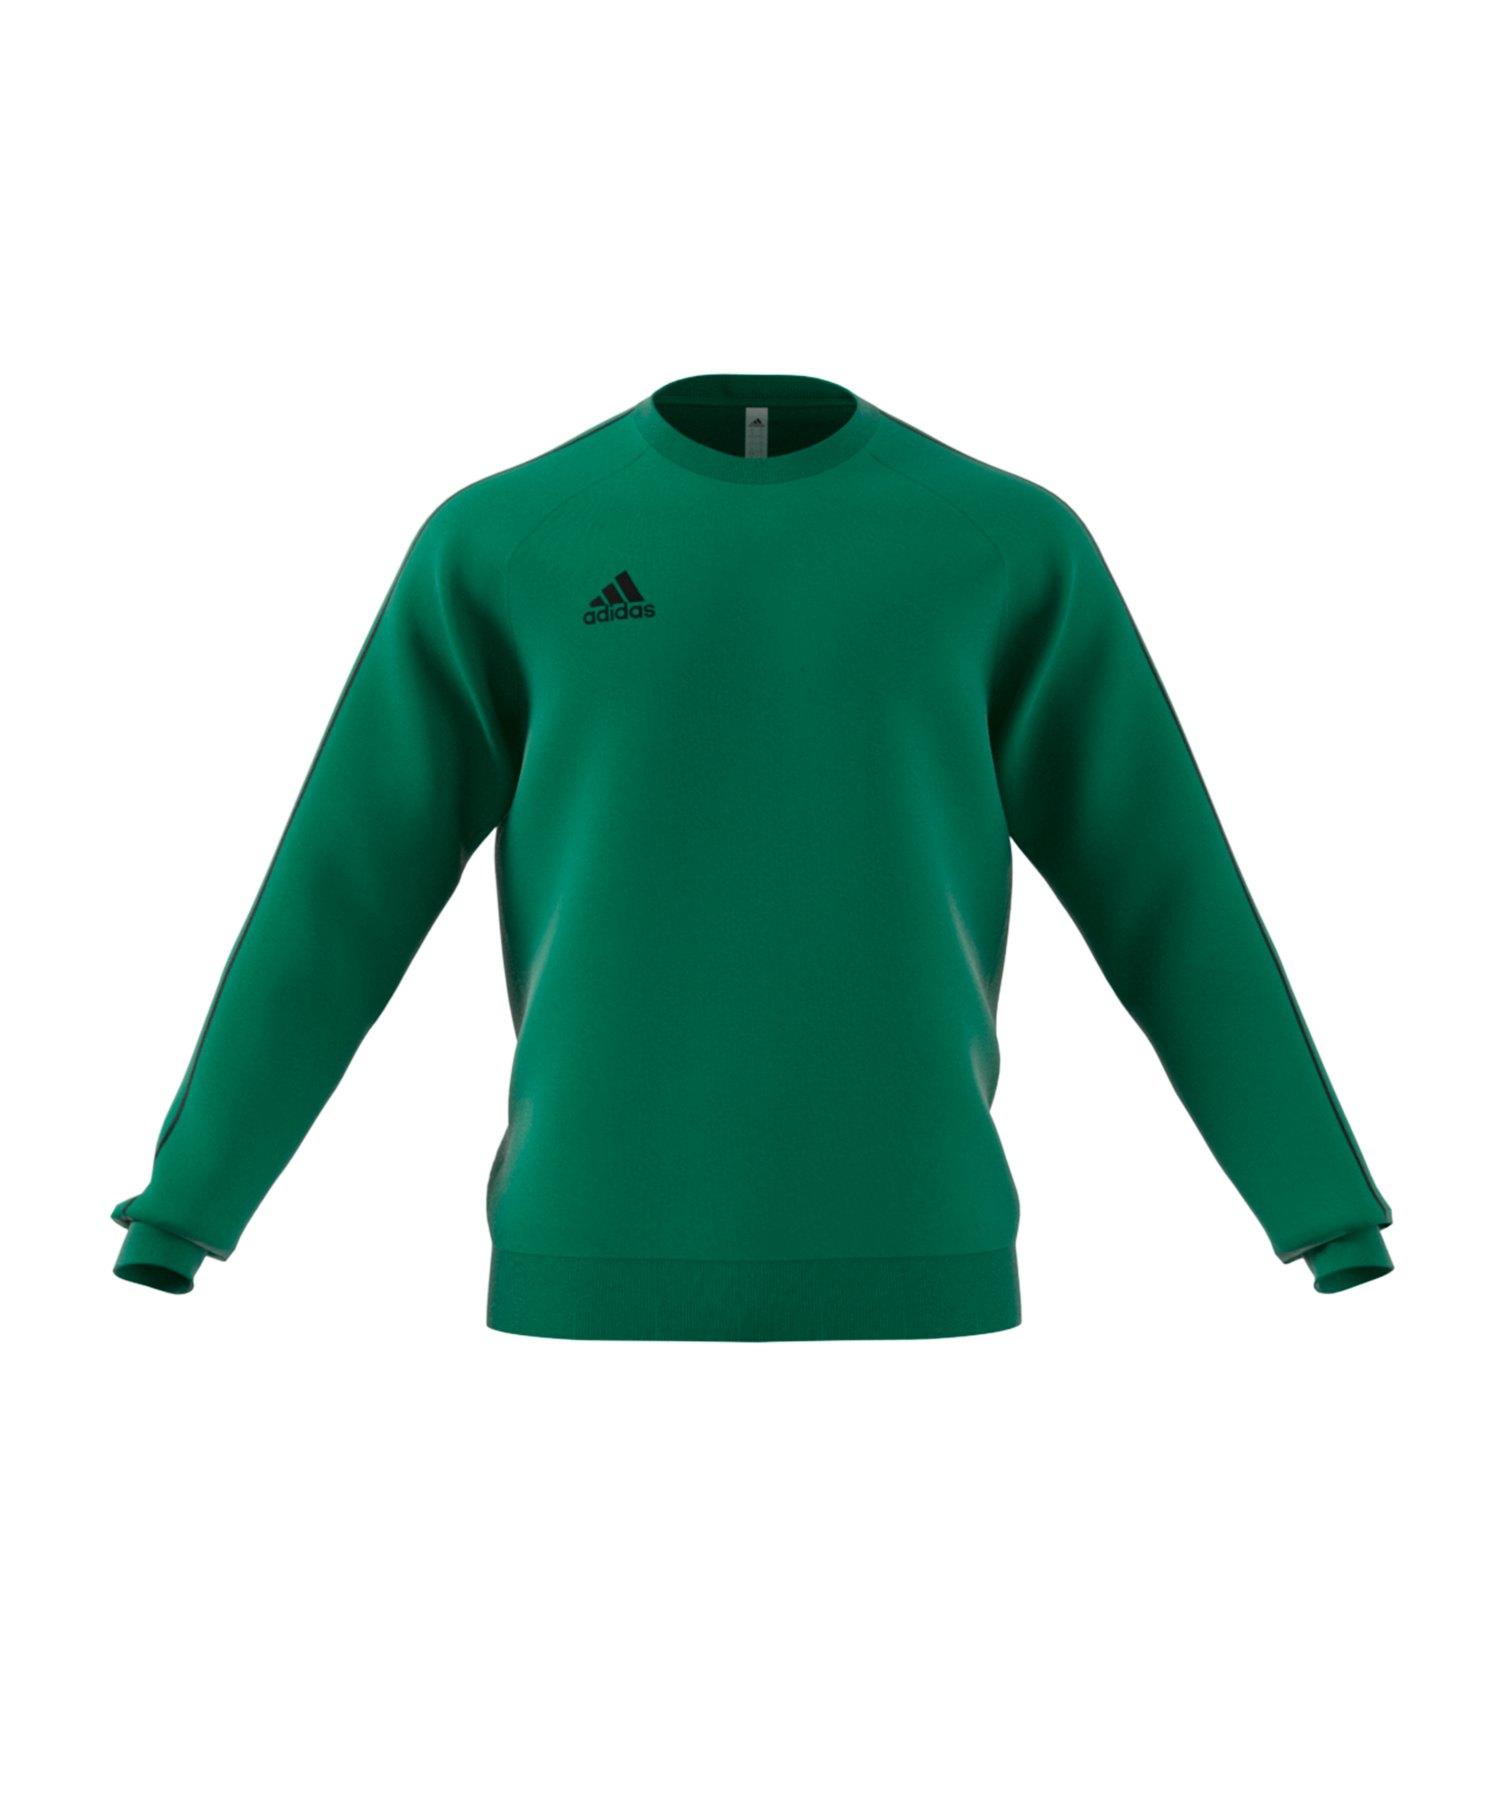 adidas Core 18 Sweatshirt Grün - gruen